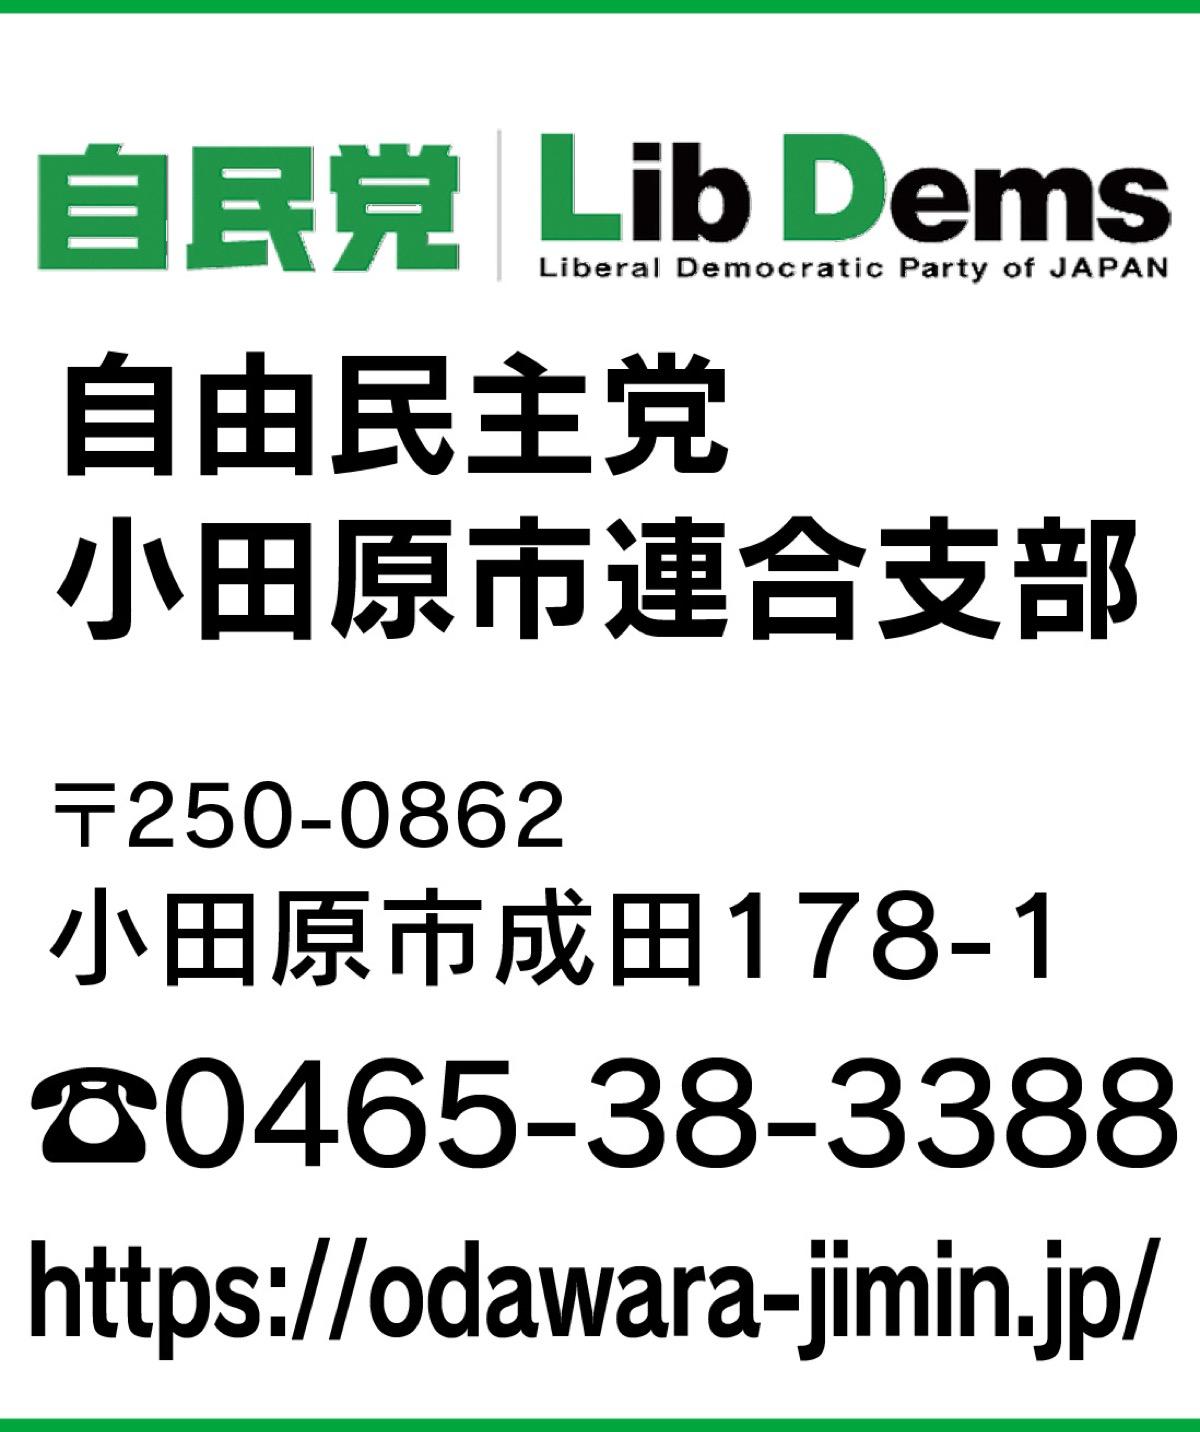 意見広告 市政の将来を左右する時 自由民主党  小田原支部 国・県・市で連携強化